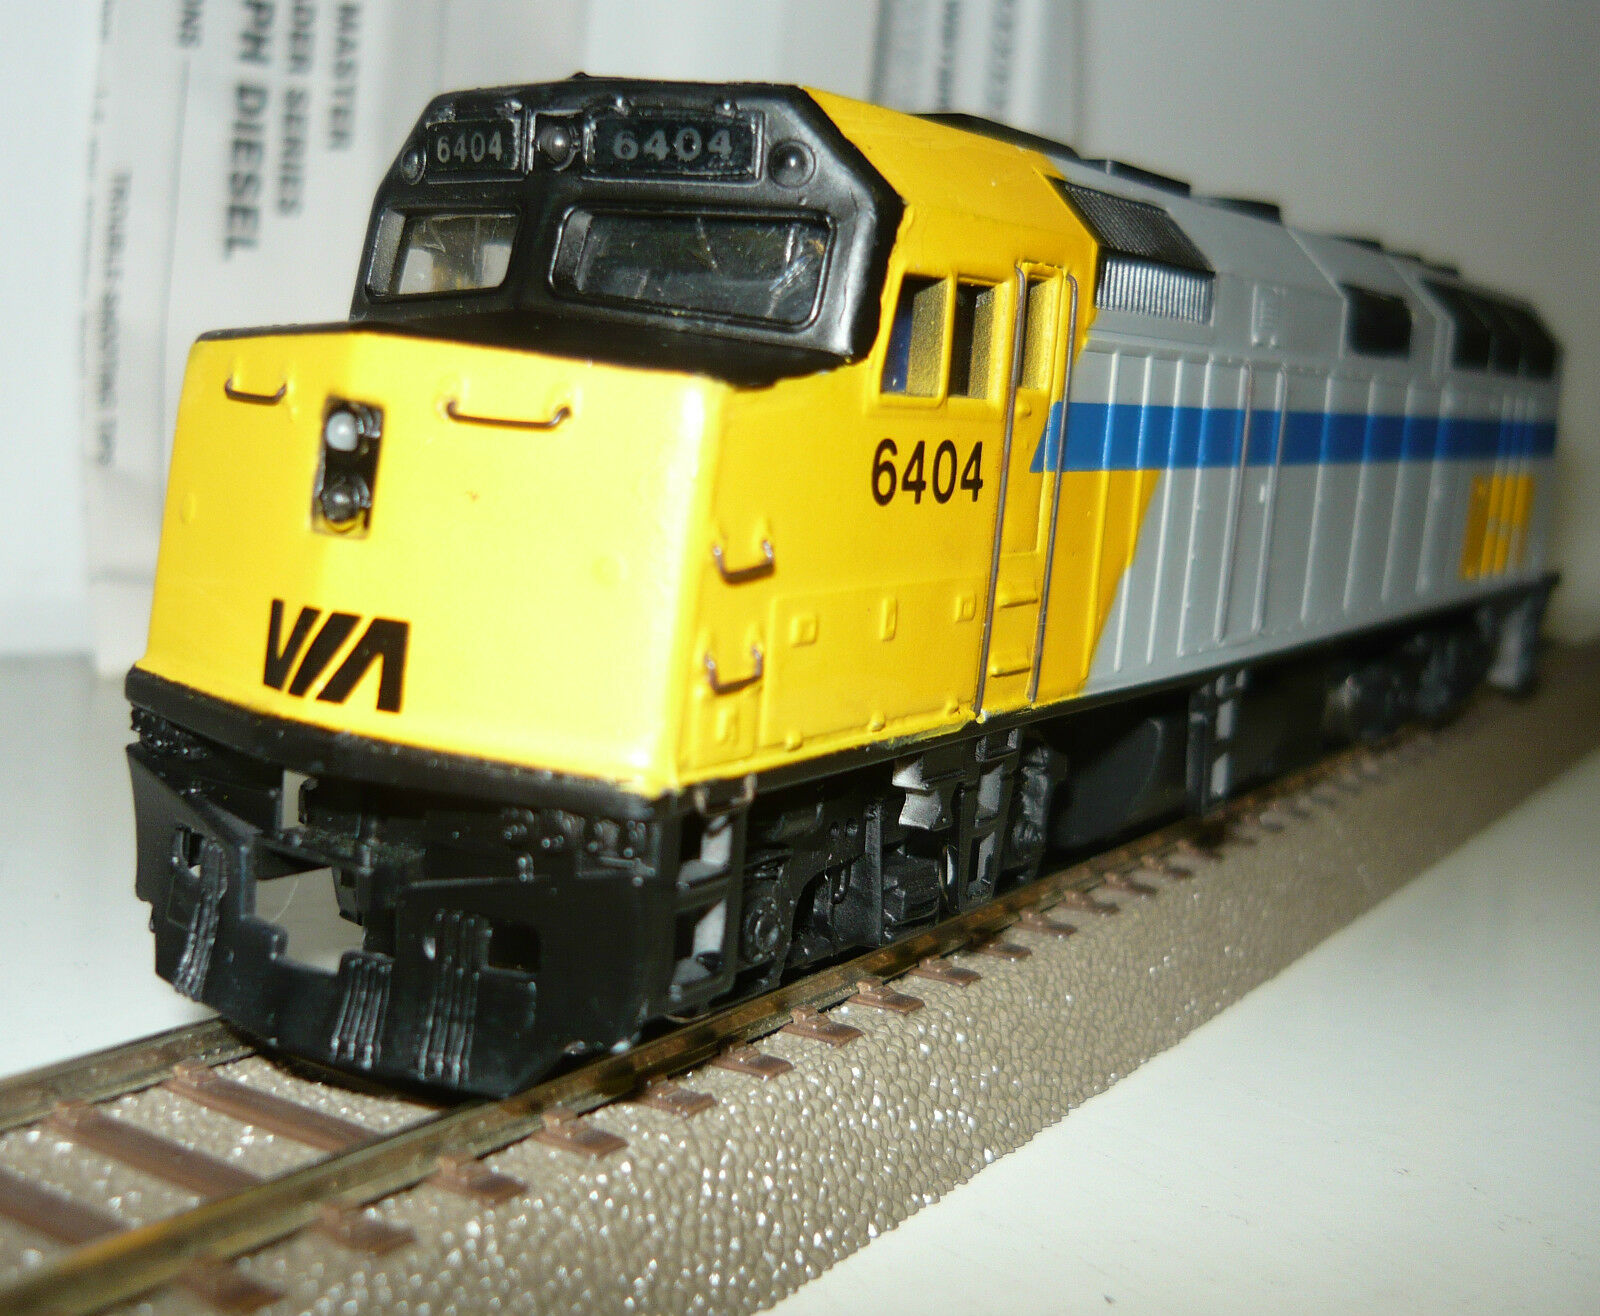 Bachmann Spectrum 87021 diesellok EMD f40ph diesel de la via, pista h0, neu&ovp